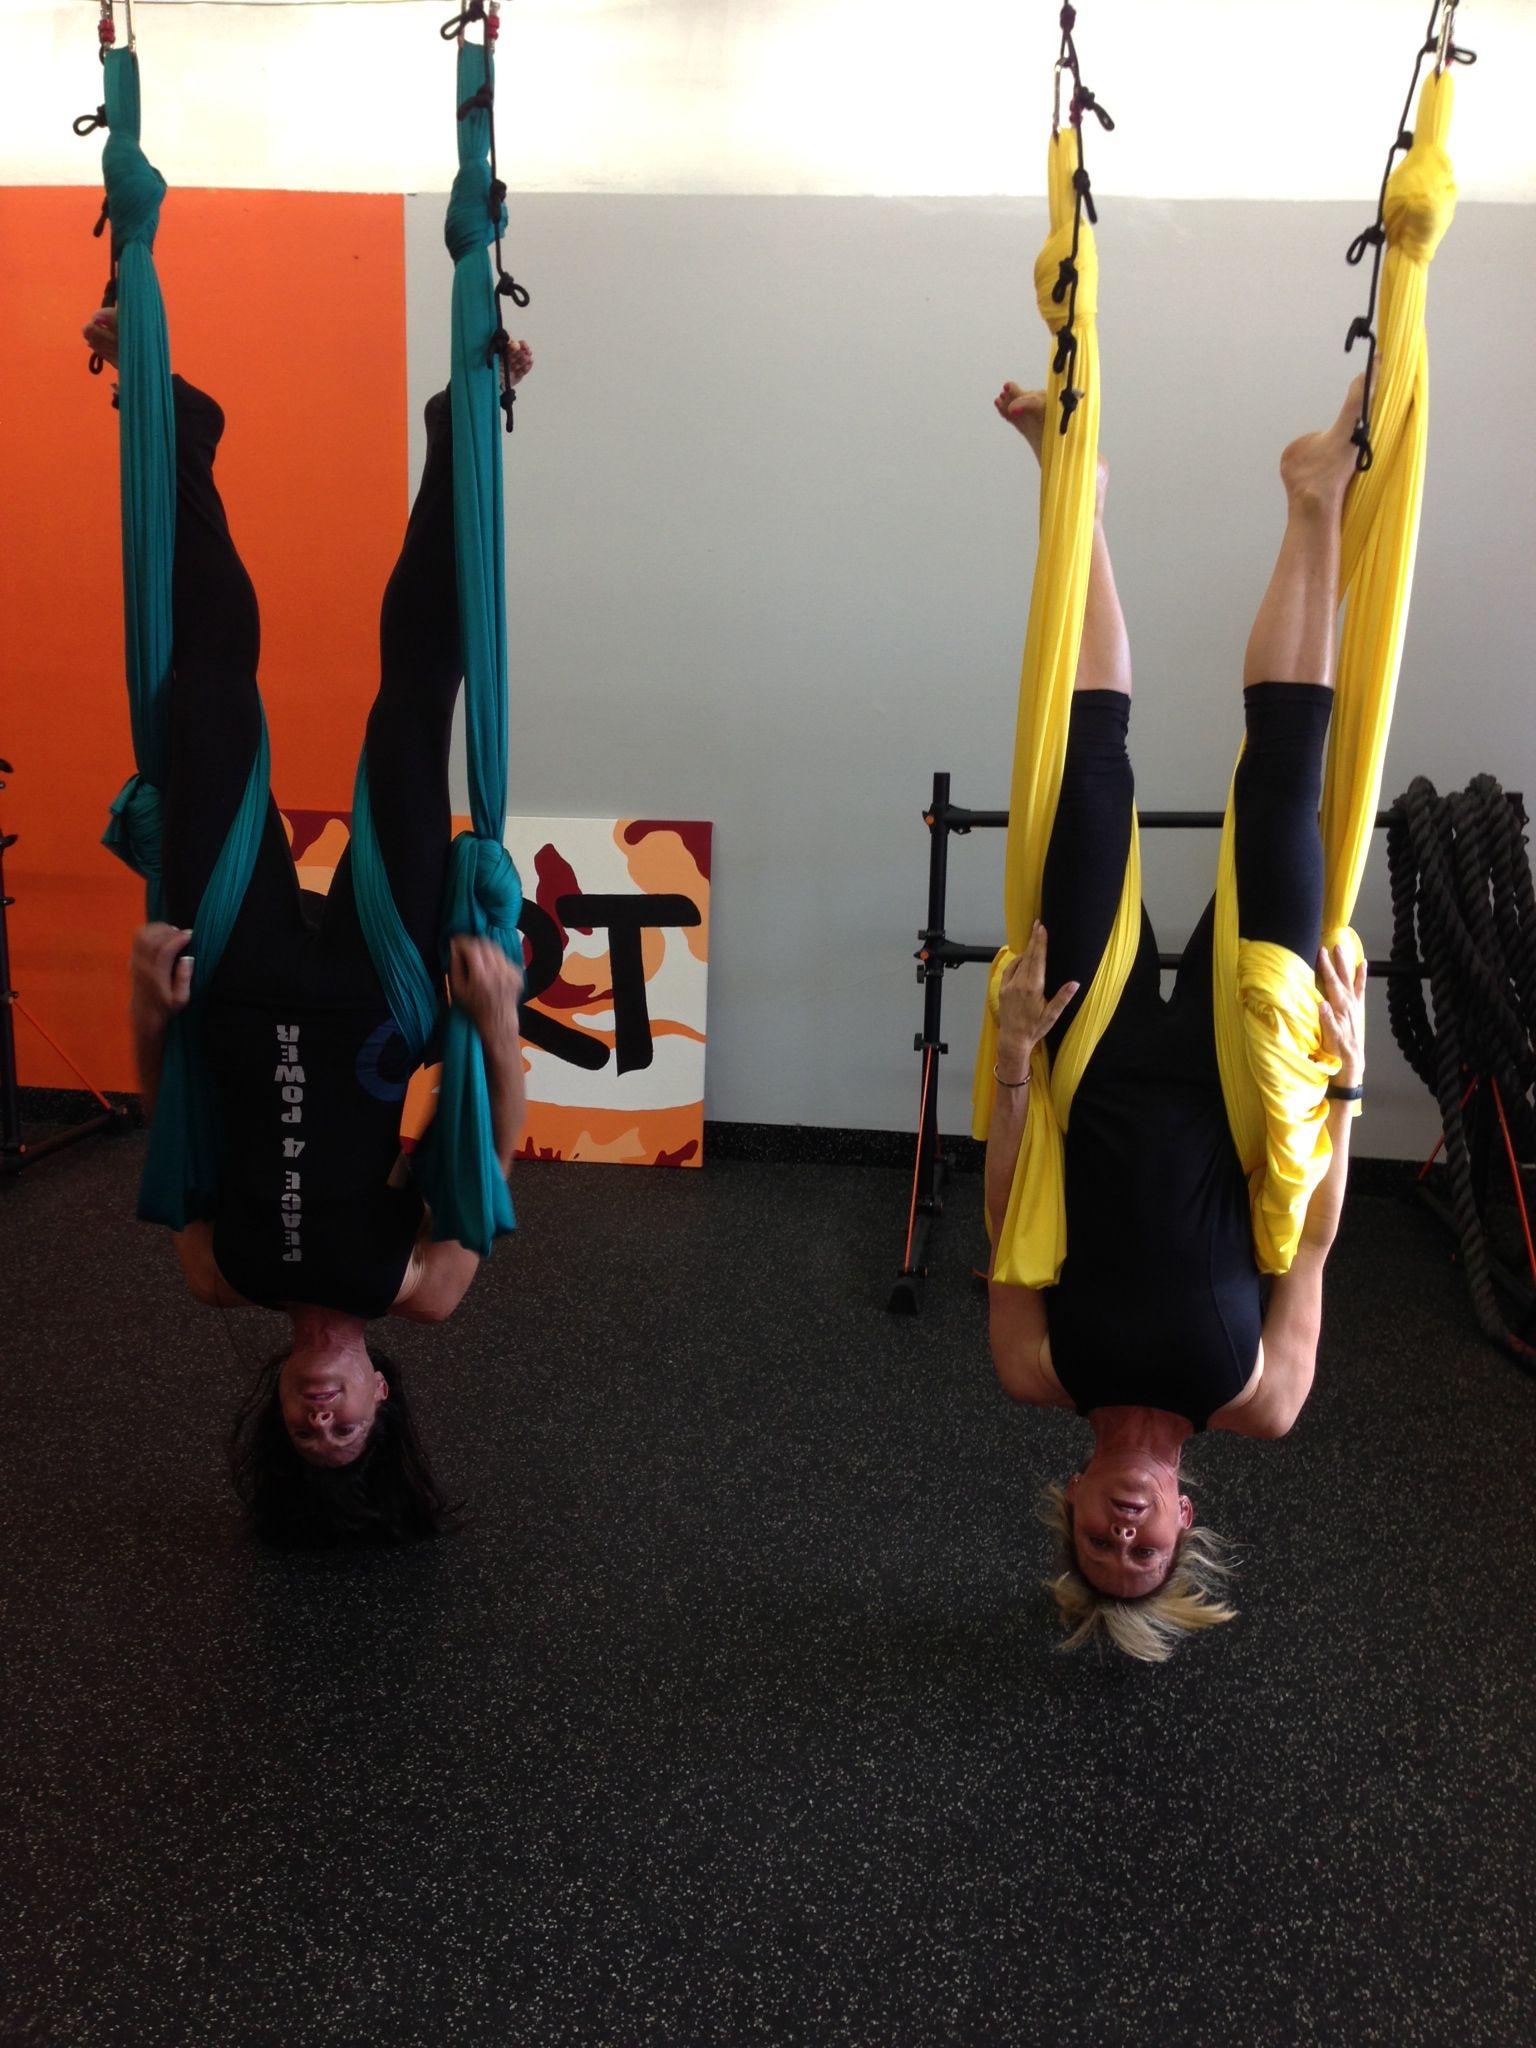 Aerial Yoga Vampire Fun With Defy Gravity Yoga Aerial Yoga